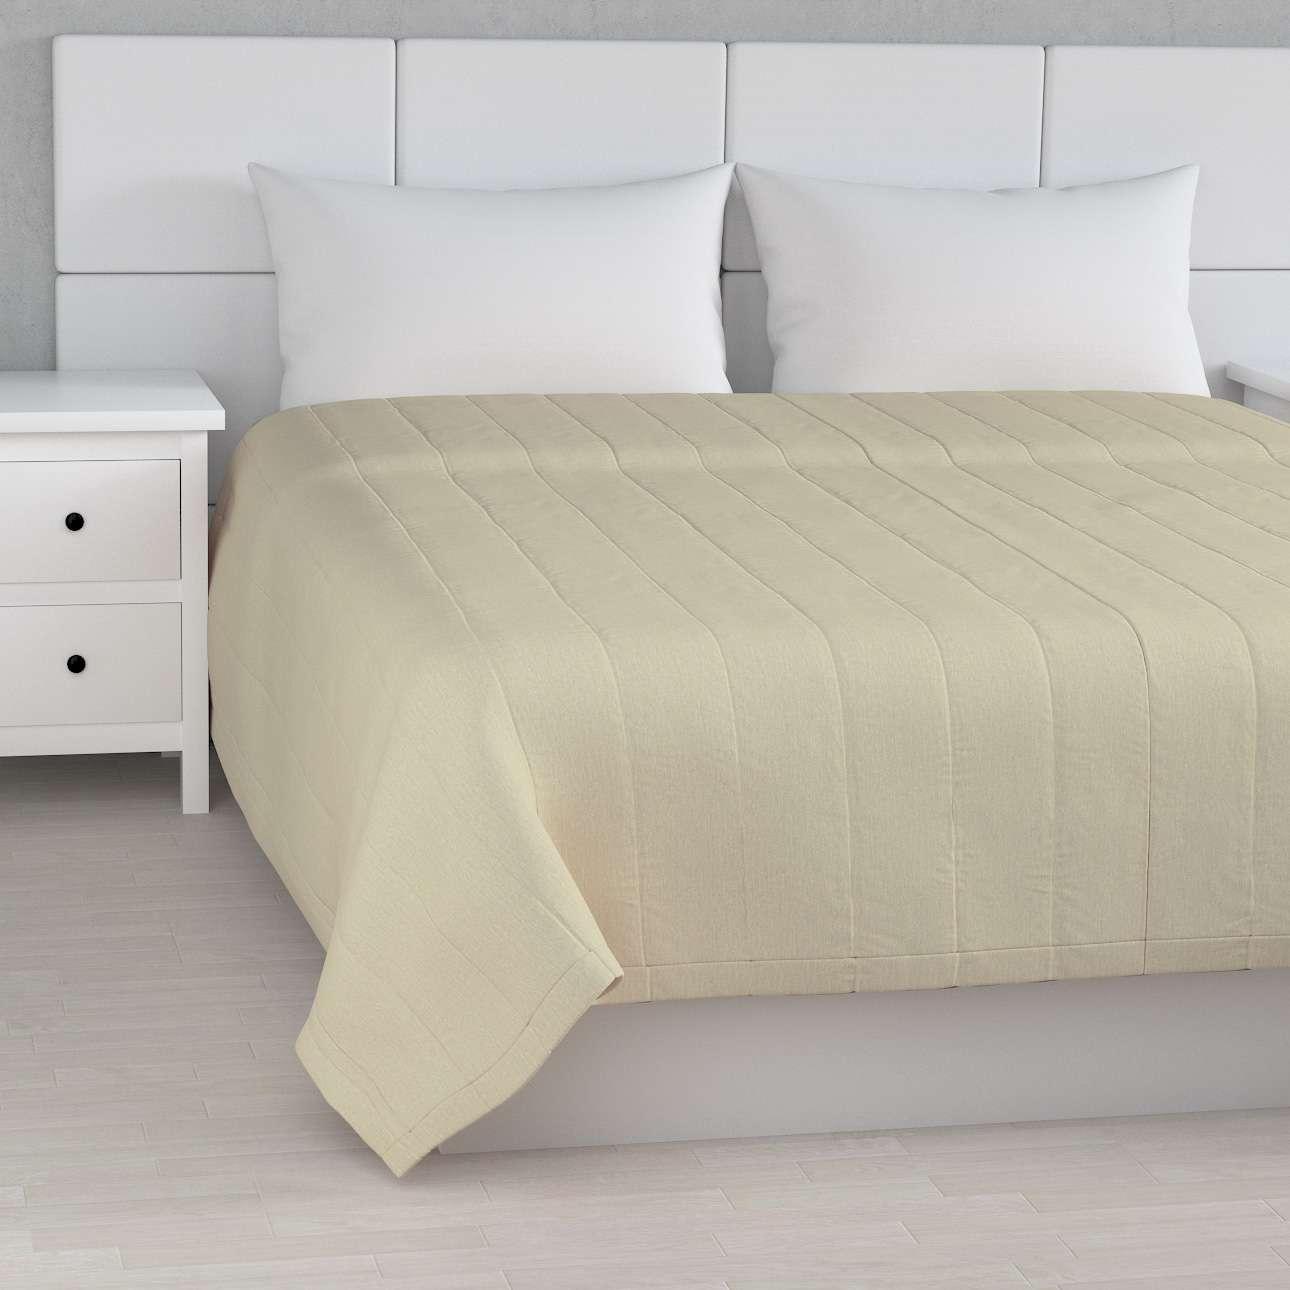 Narzuta pikowana w pasy w kolekcji Chenille, tkanina: 702-22